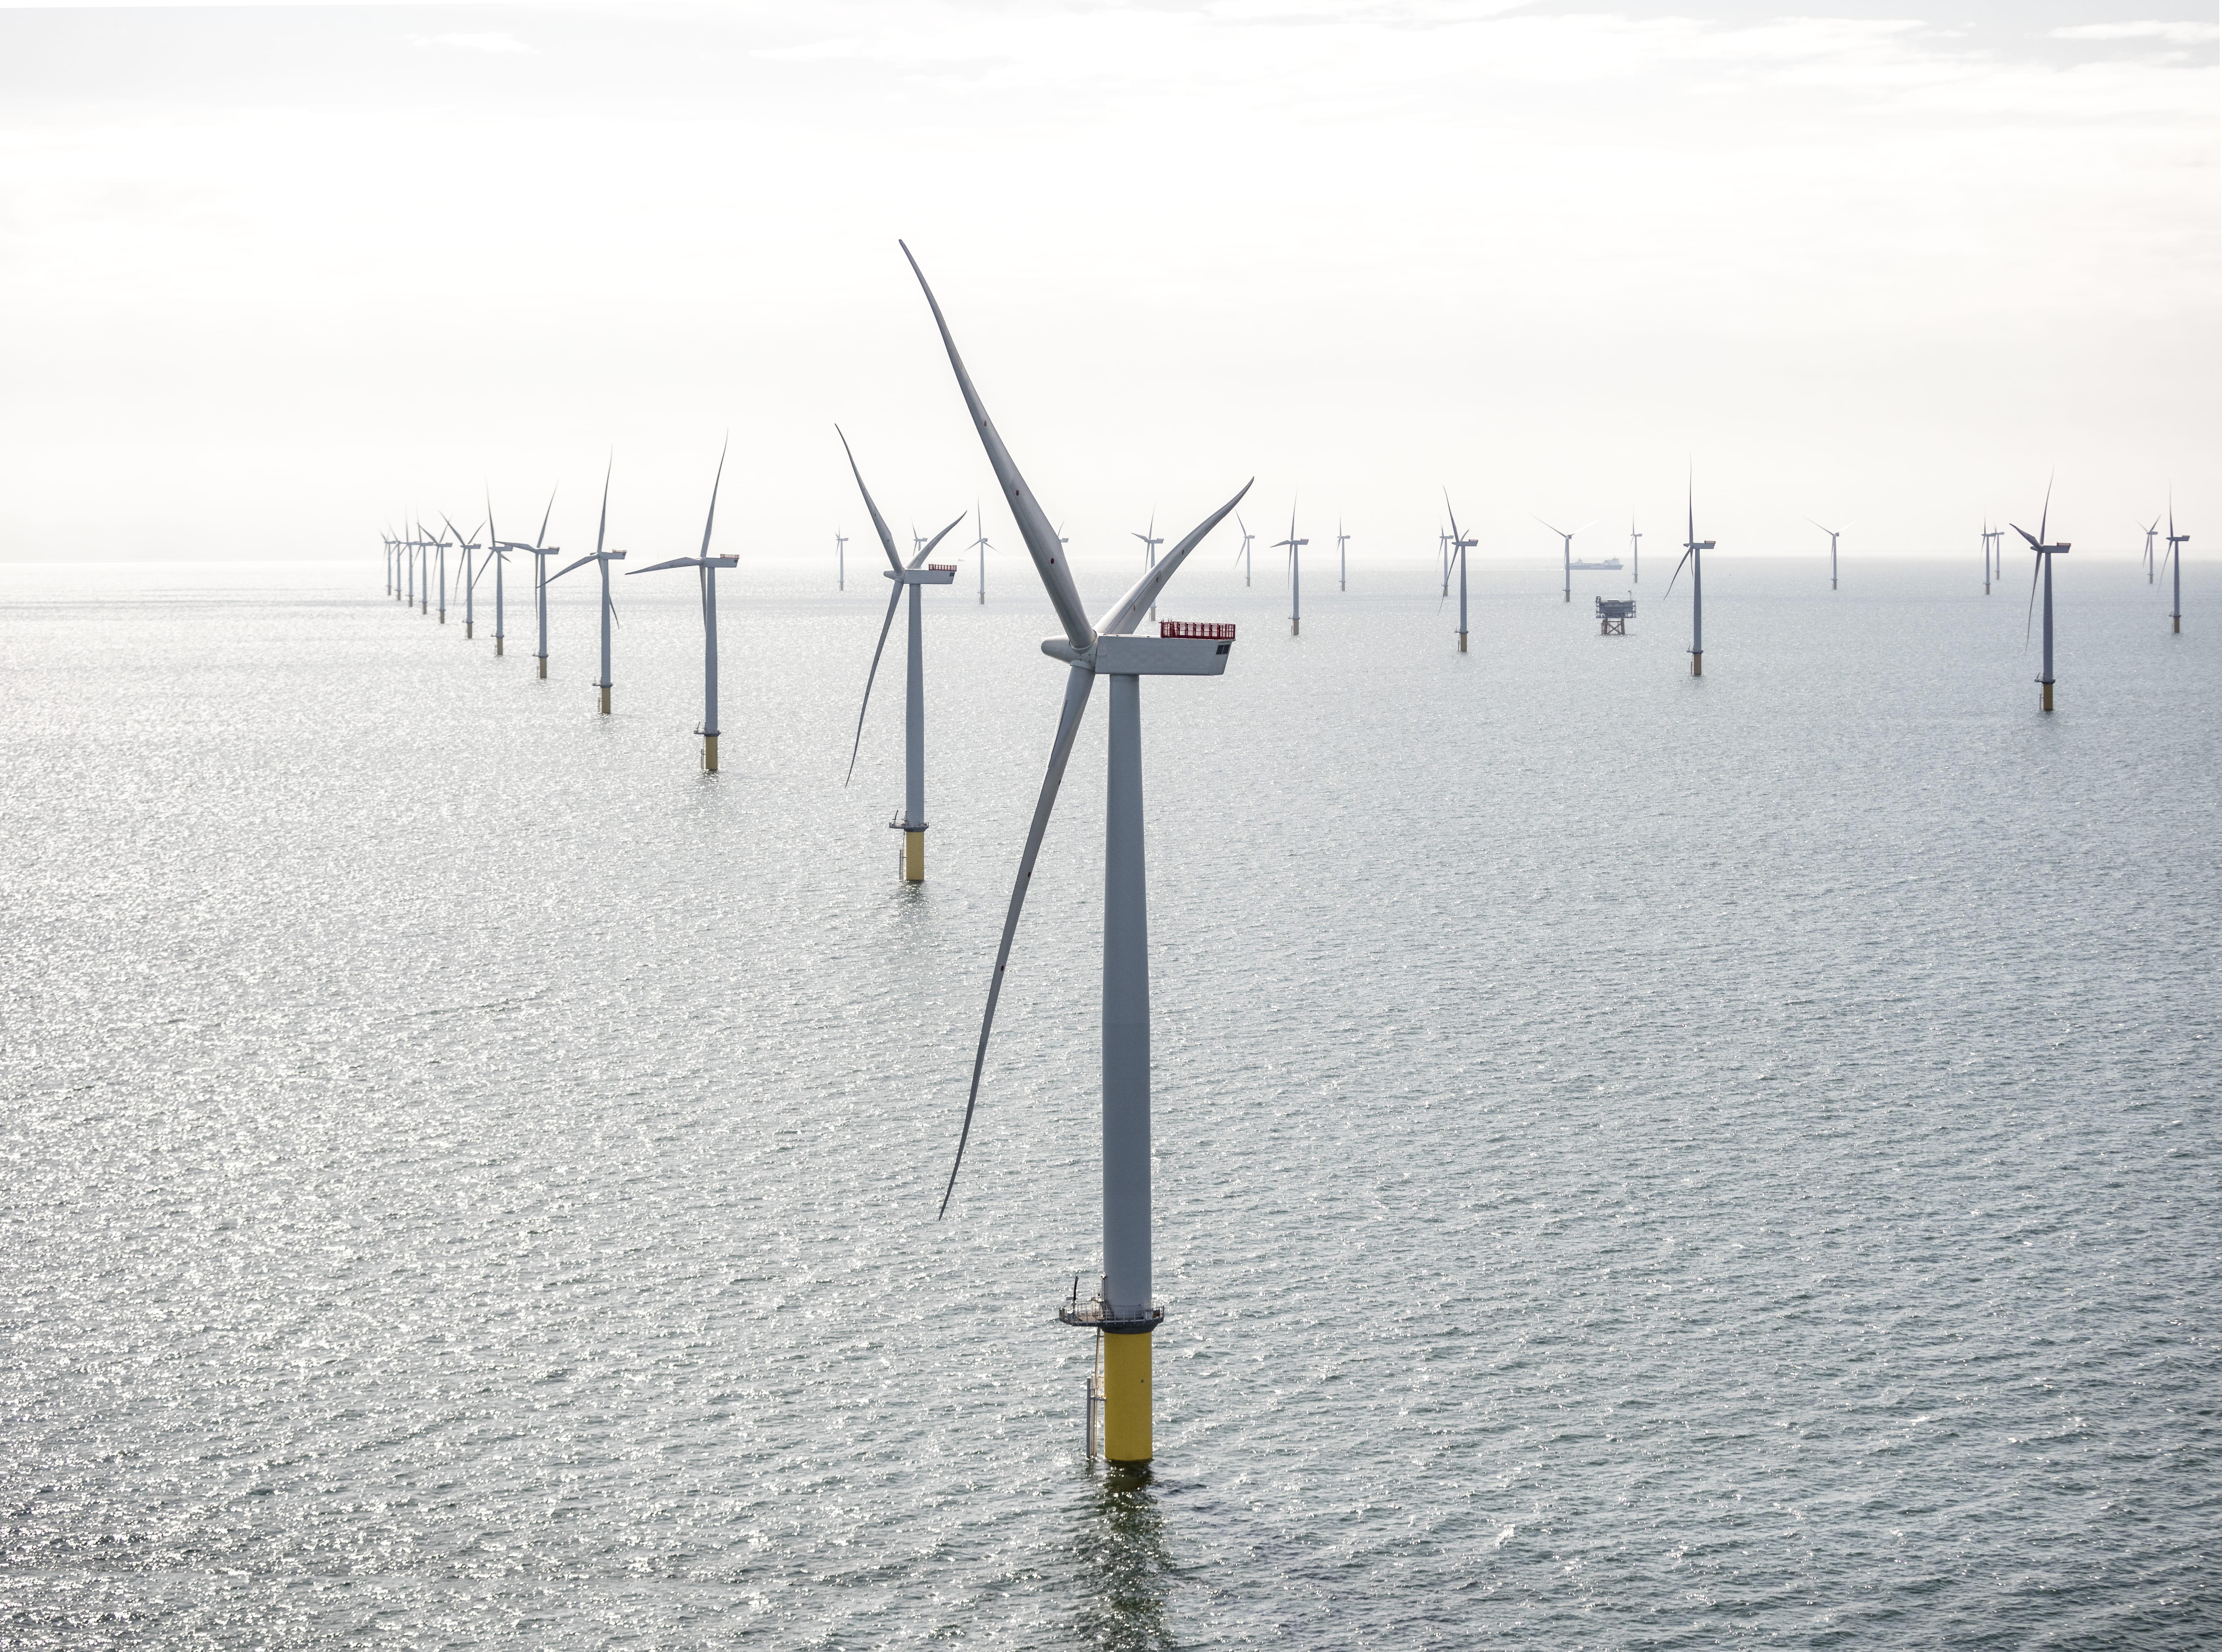 West of Dunddon Sands offshore wind farm